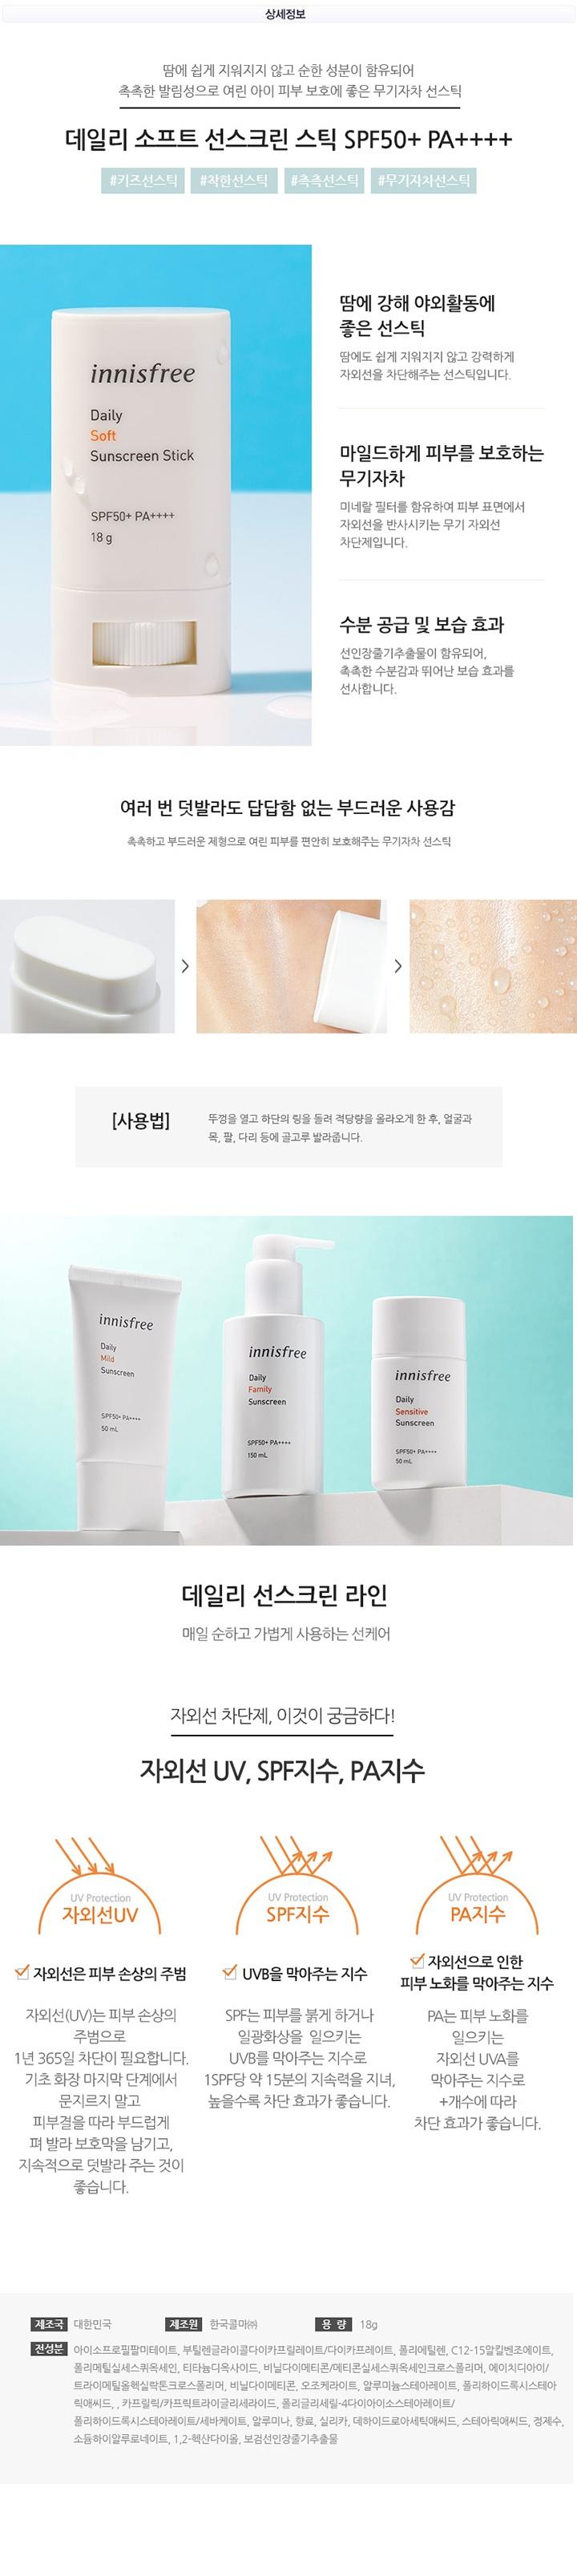 Innisfree Daily Soft Sunscreen Stick korean skincare product online shop malaysia china hong kong1